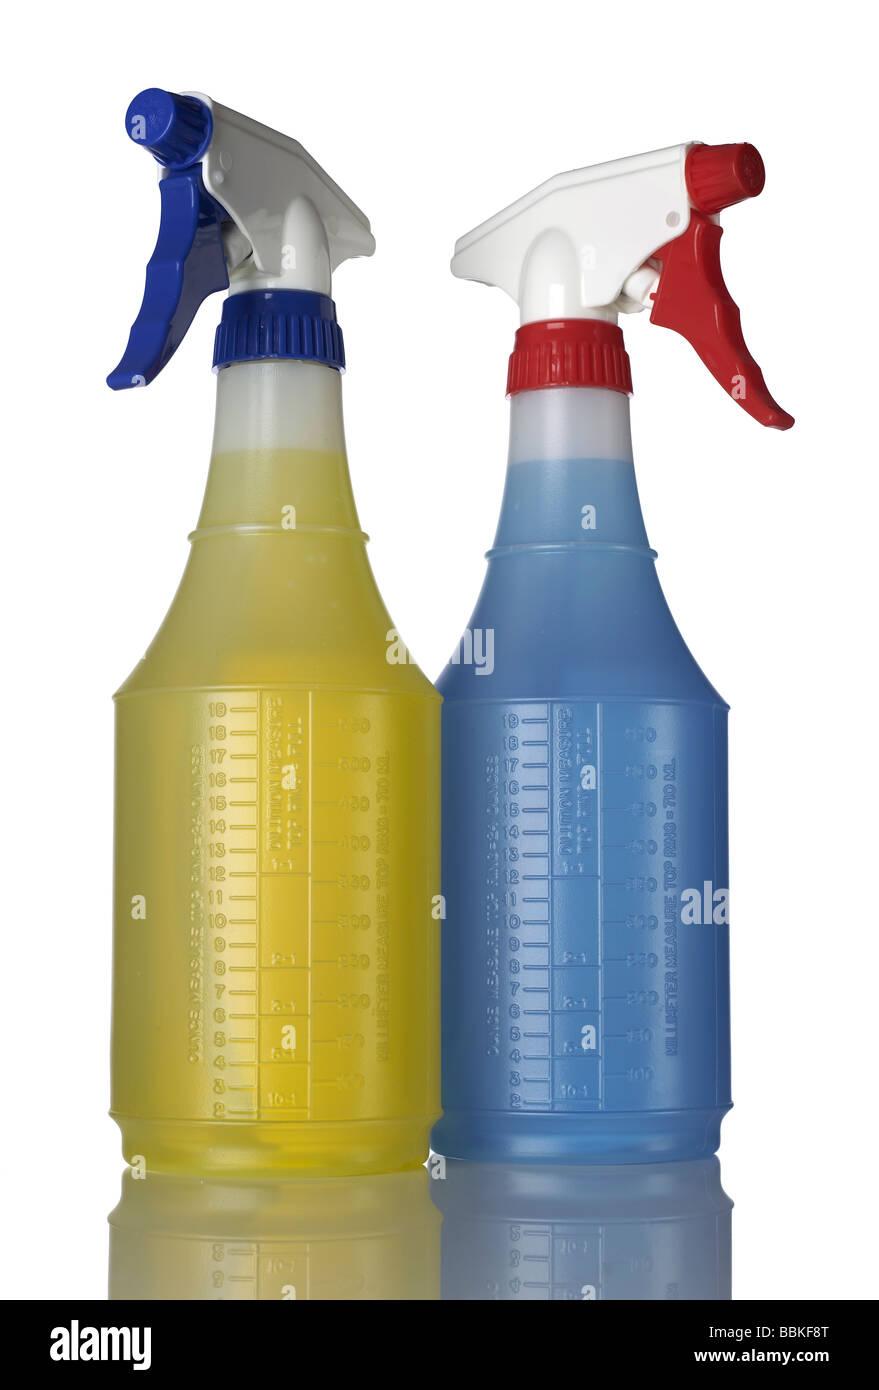 2 dos frascos pulverizadores Foto de stock